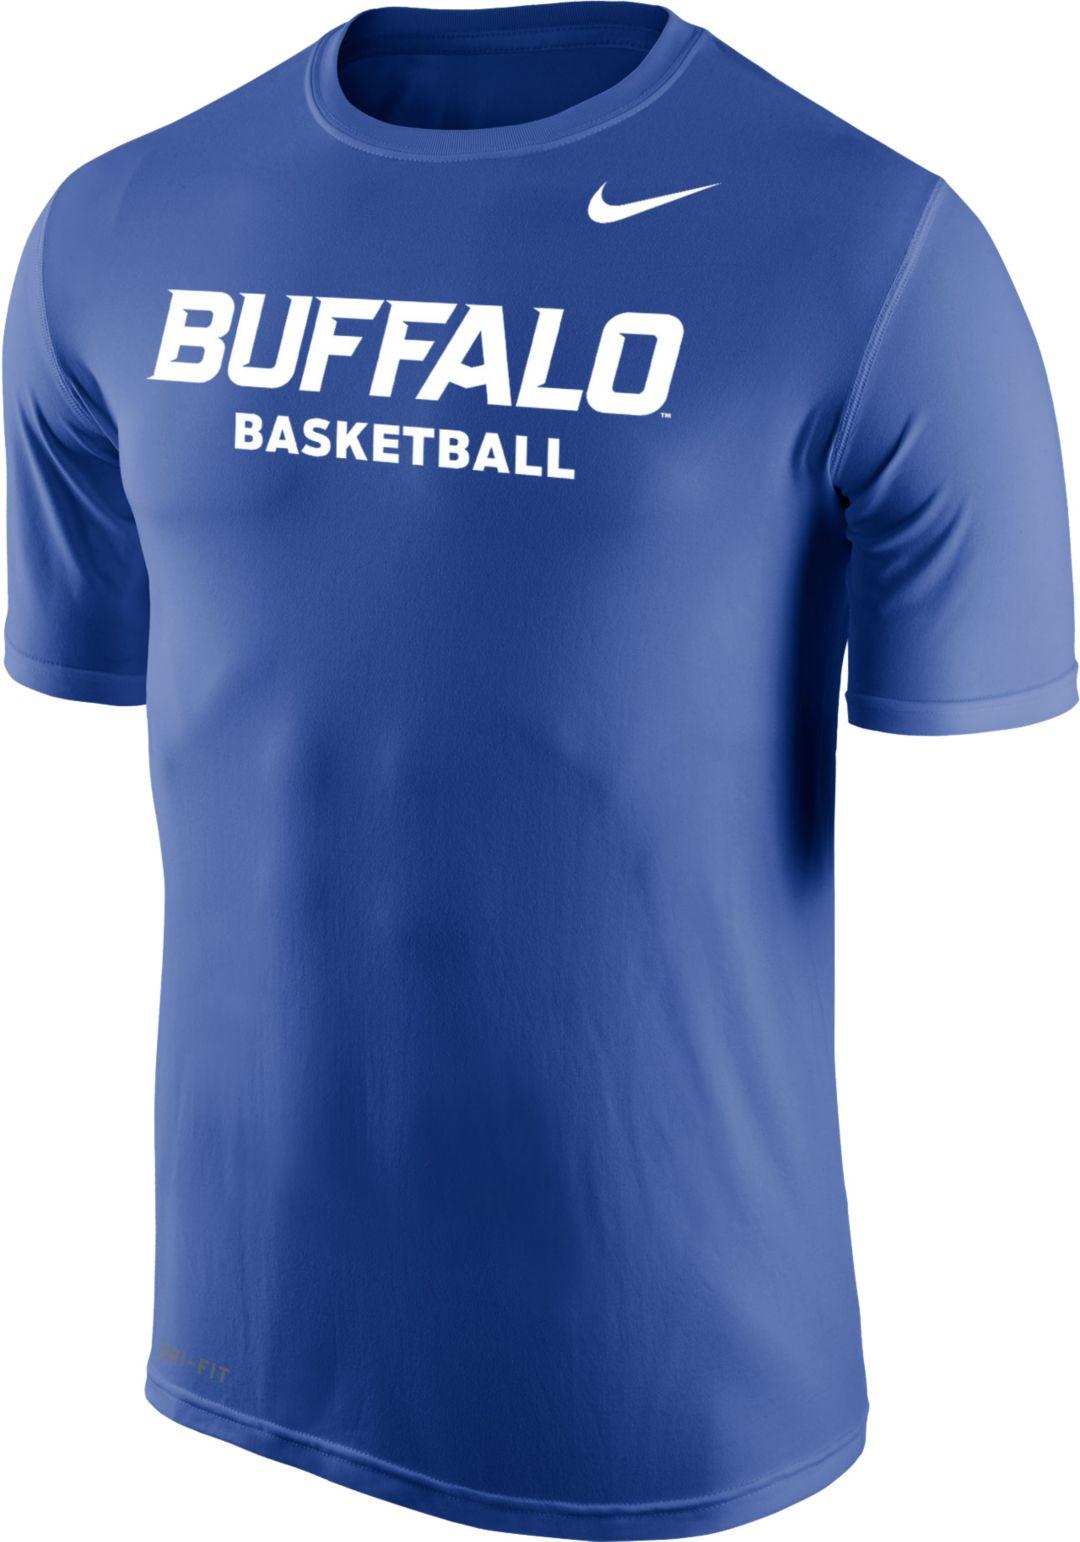 size 40 87c74 53de6 Nike Men's Buffalo Bulls Blue Dri-FIT Legend 2.0 Basketball T-Shirt